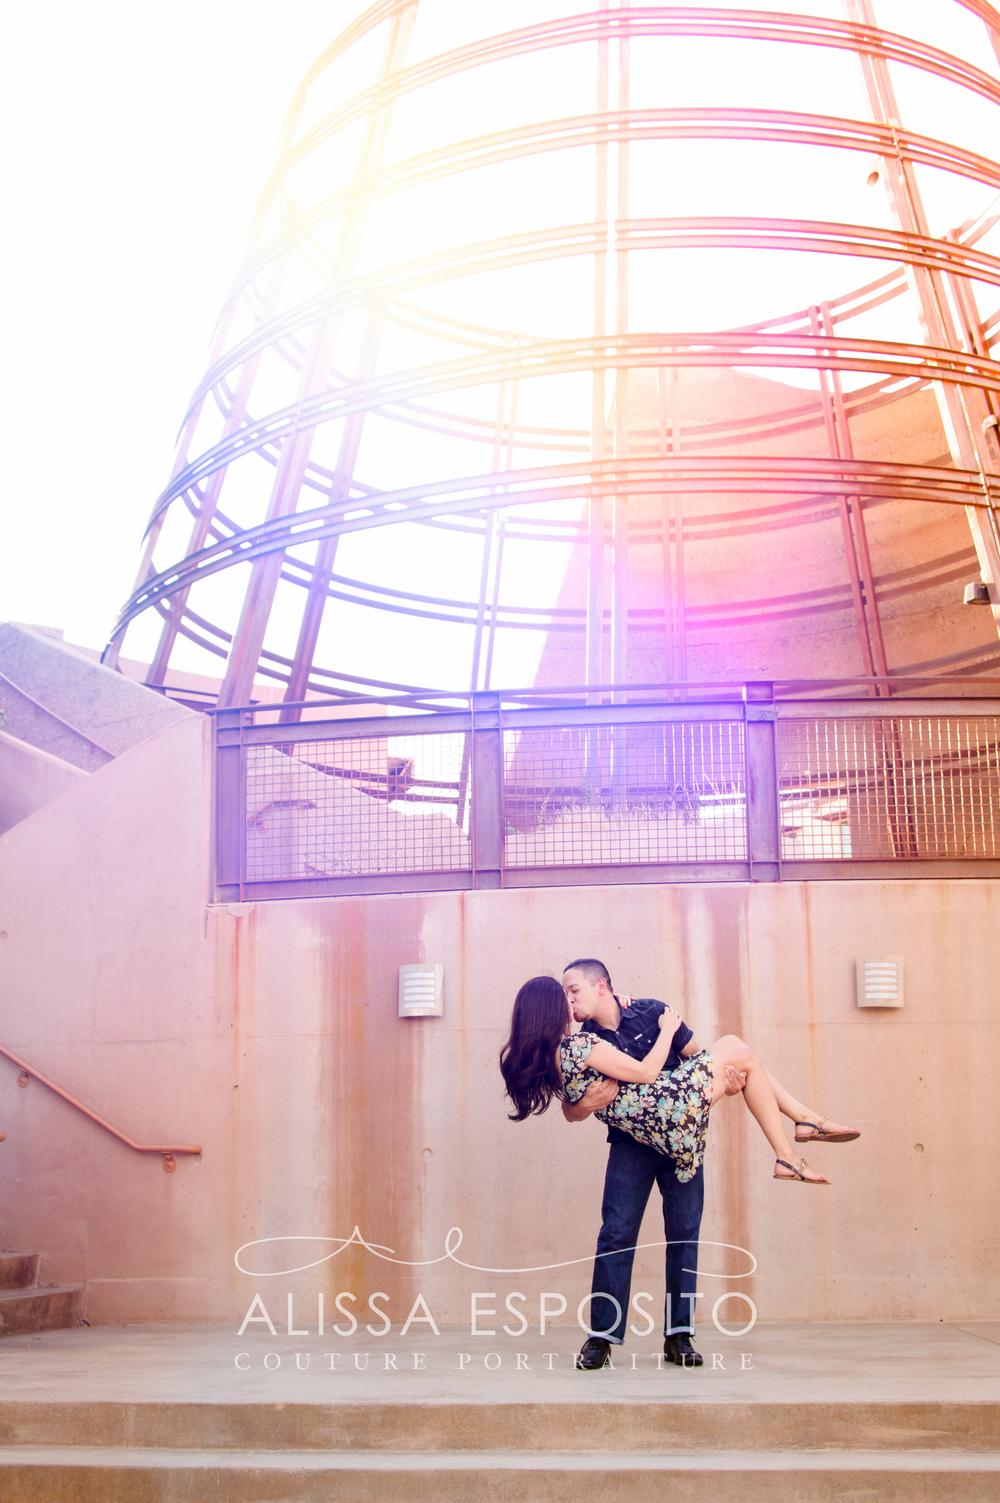 Alissa Esposito Las Vegas Wedding Photographer